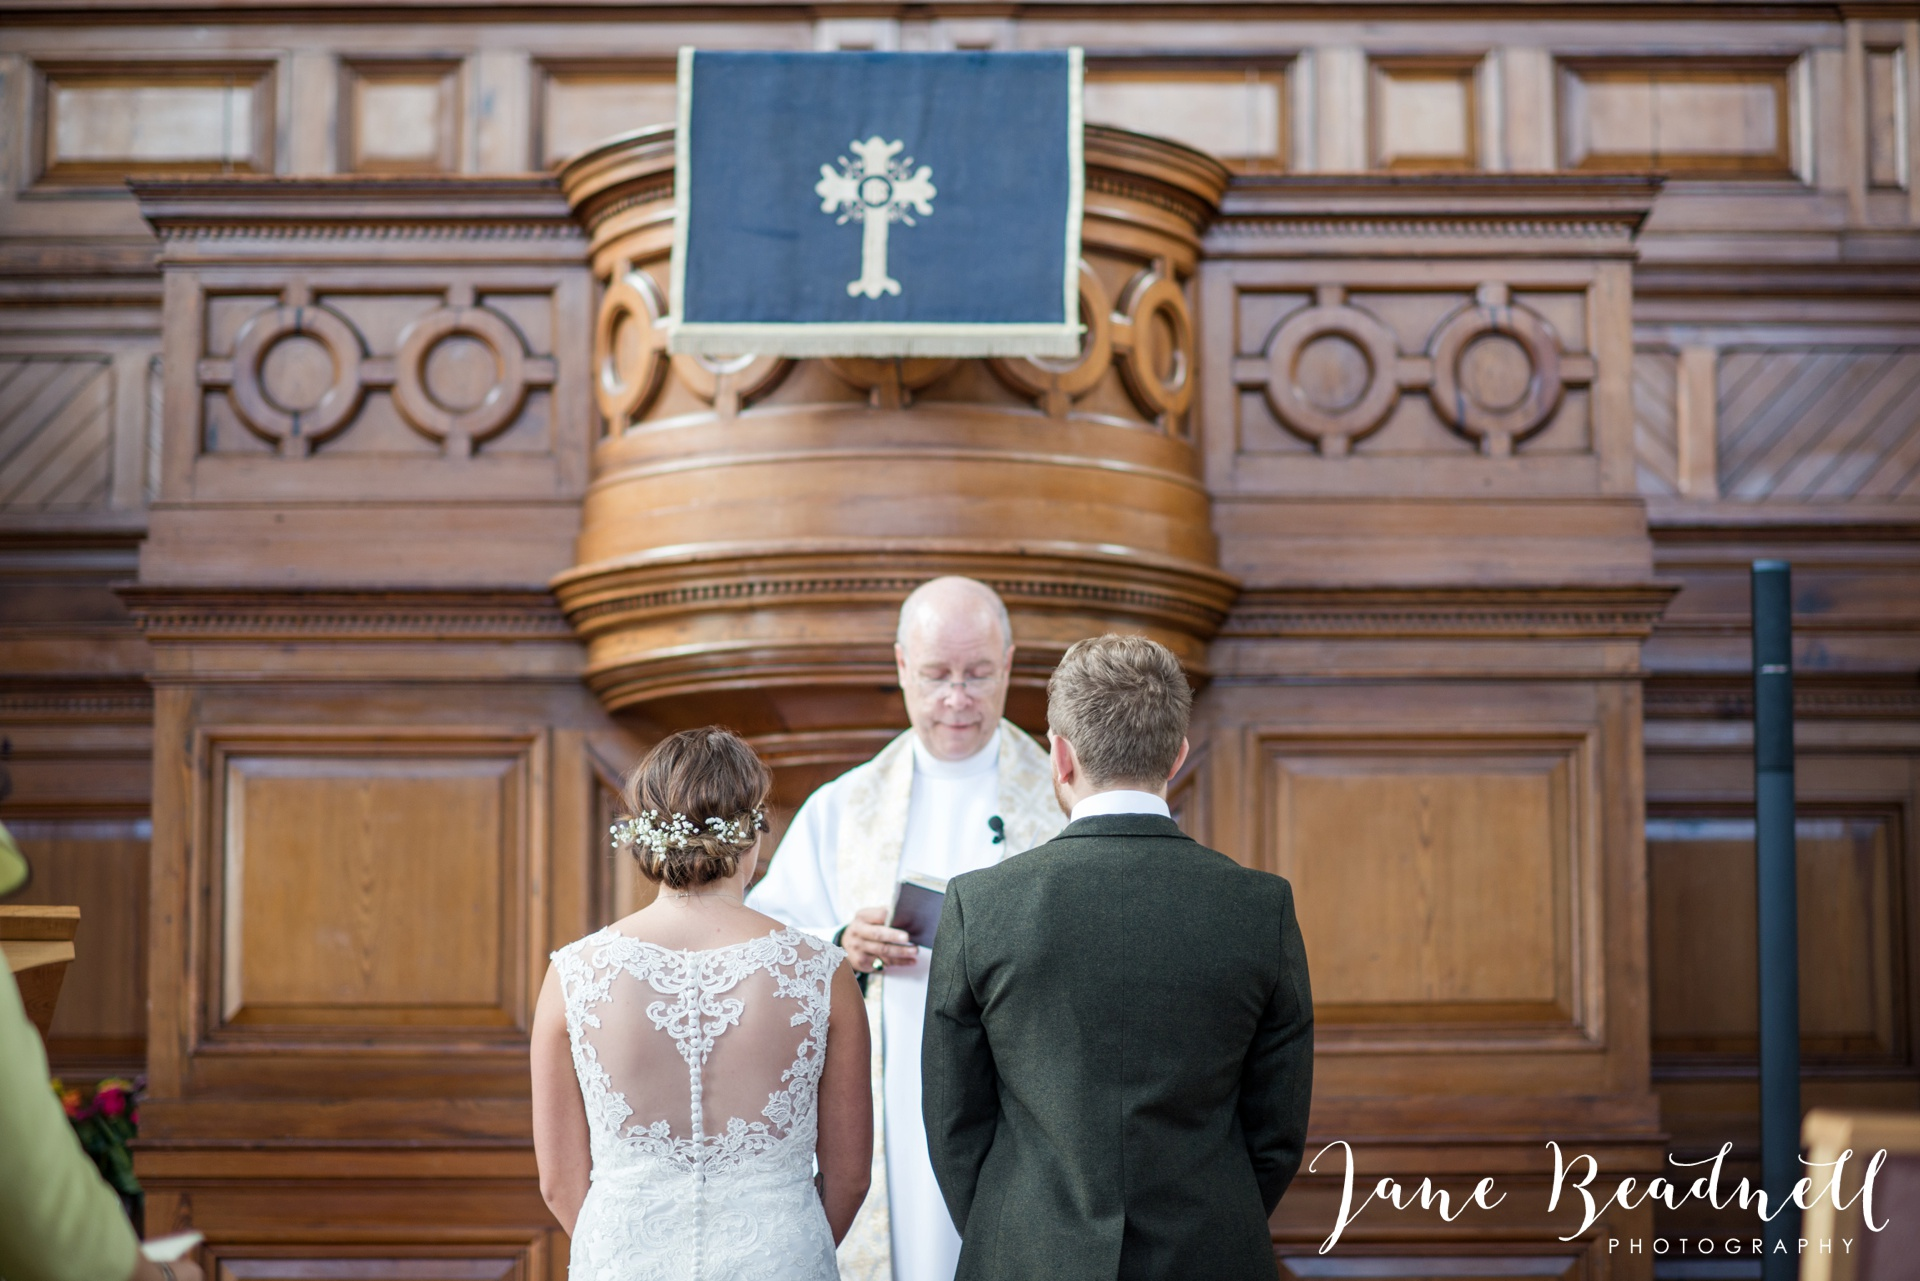 Jane Beadnell fine art wedding photographer The Old Deanery Ripon_0039